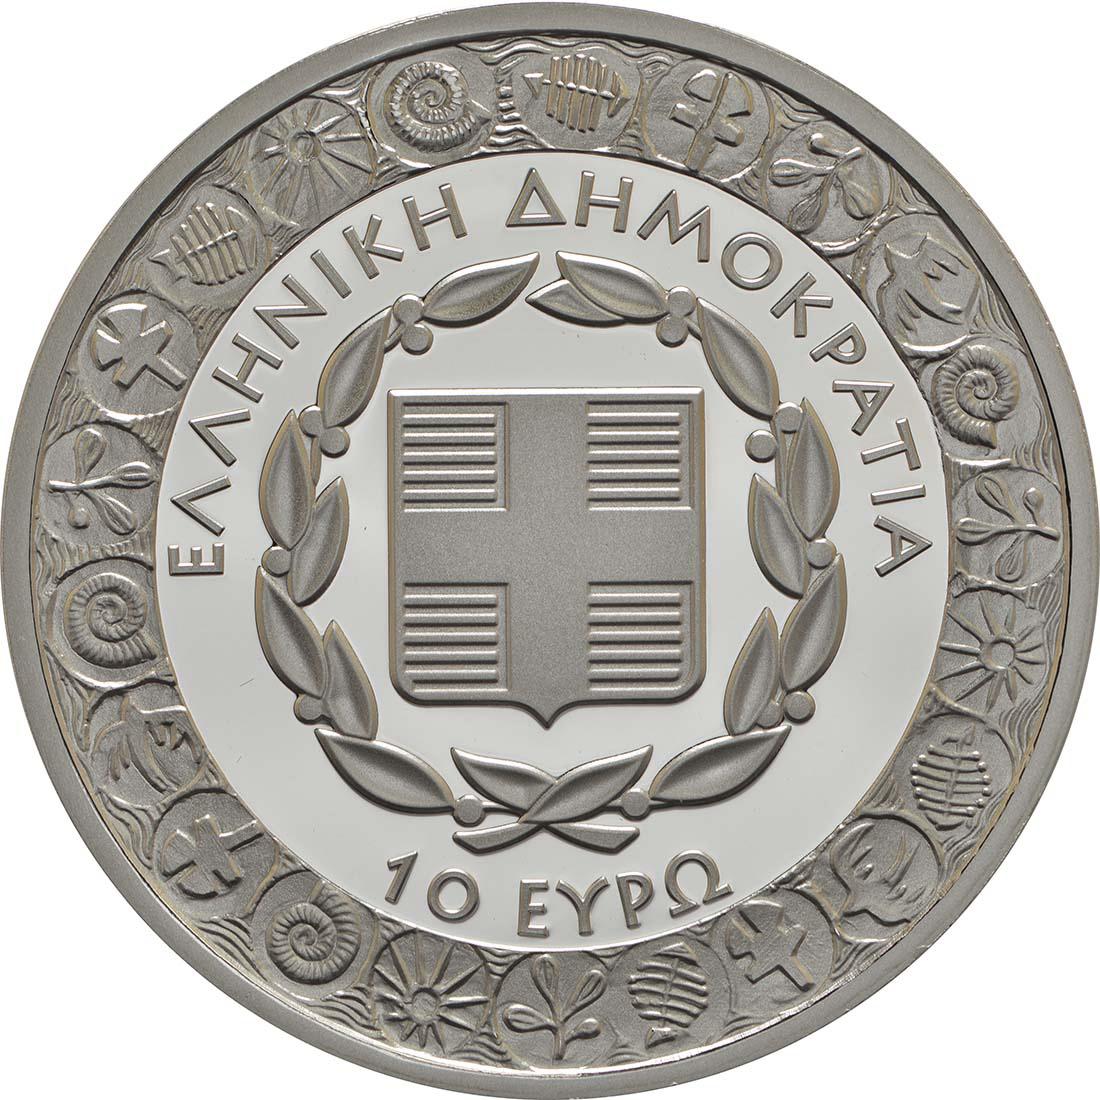 Griechenland,-10-Ôé¼,-Av.